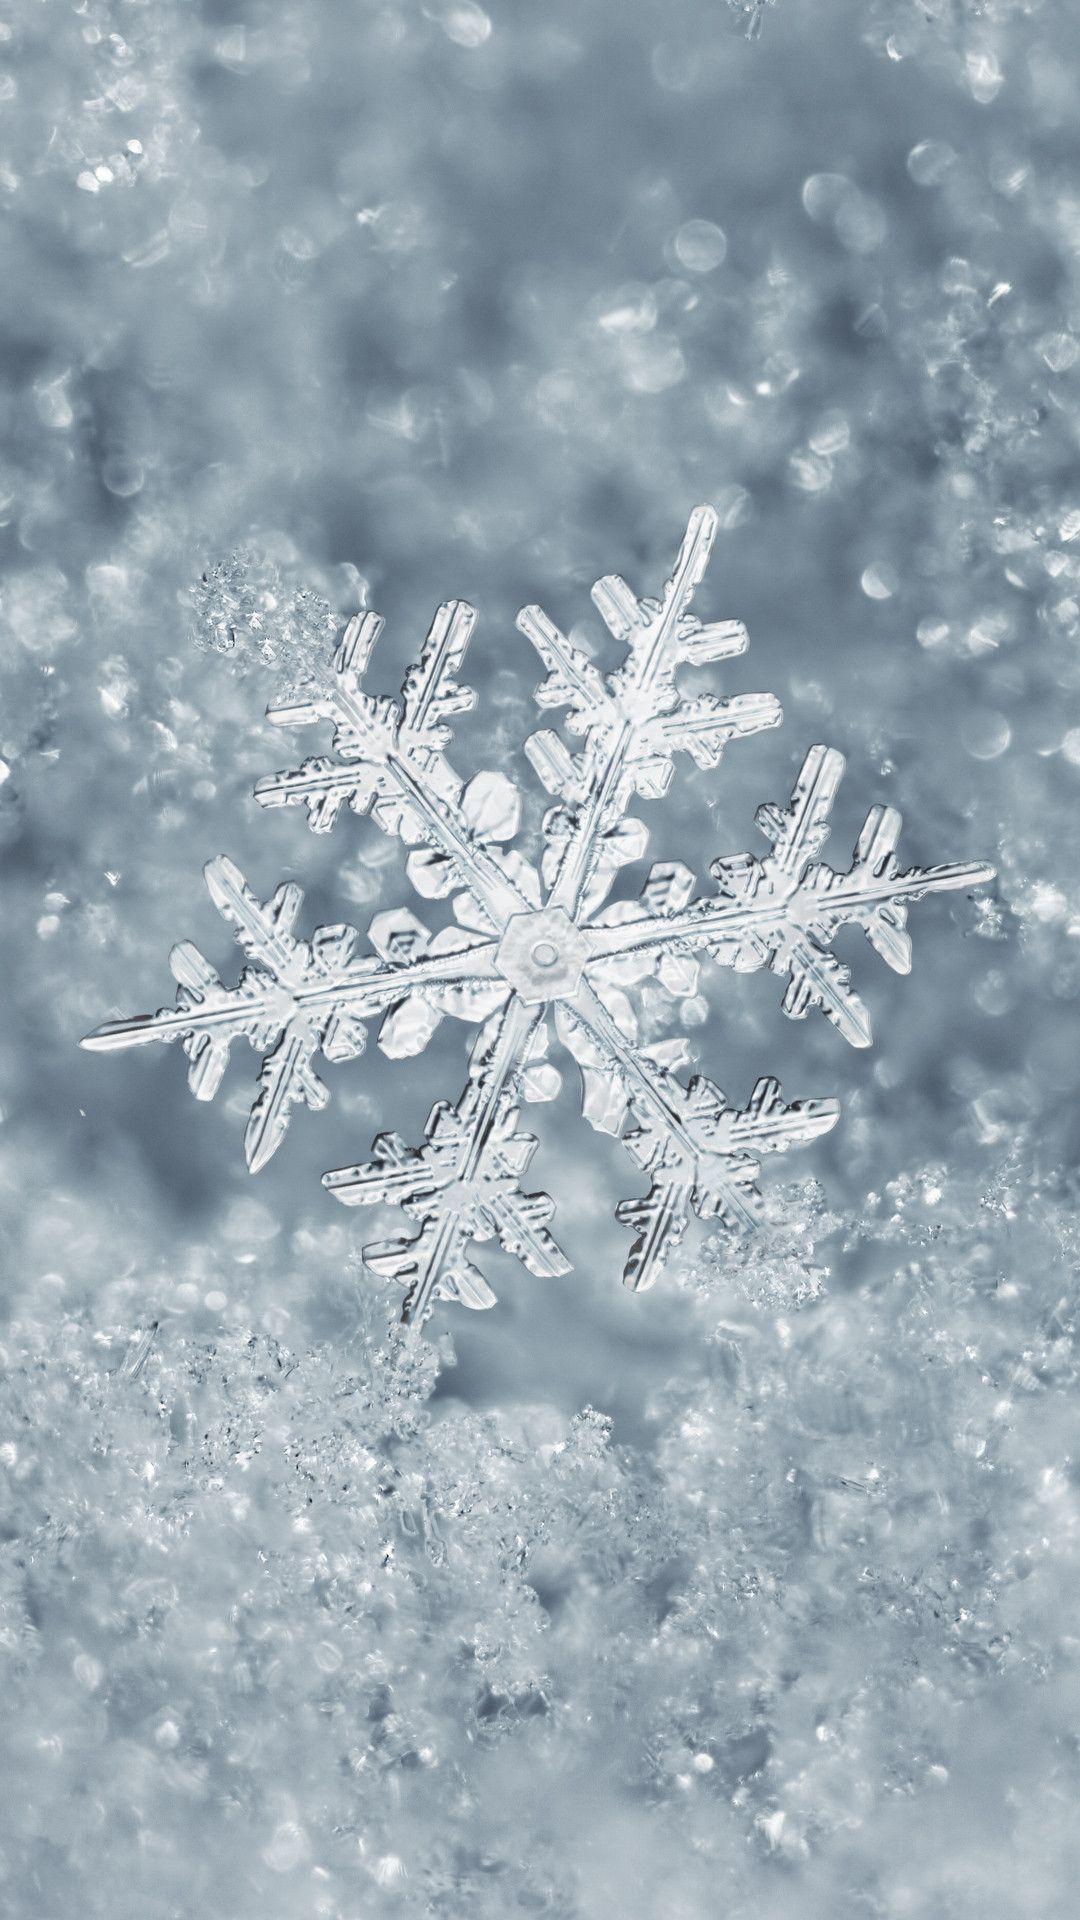 Snowflake Iphone Wallpaper スノーフレーク 背景 冬の景色